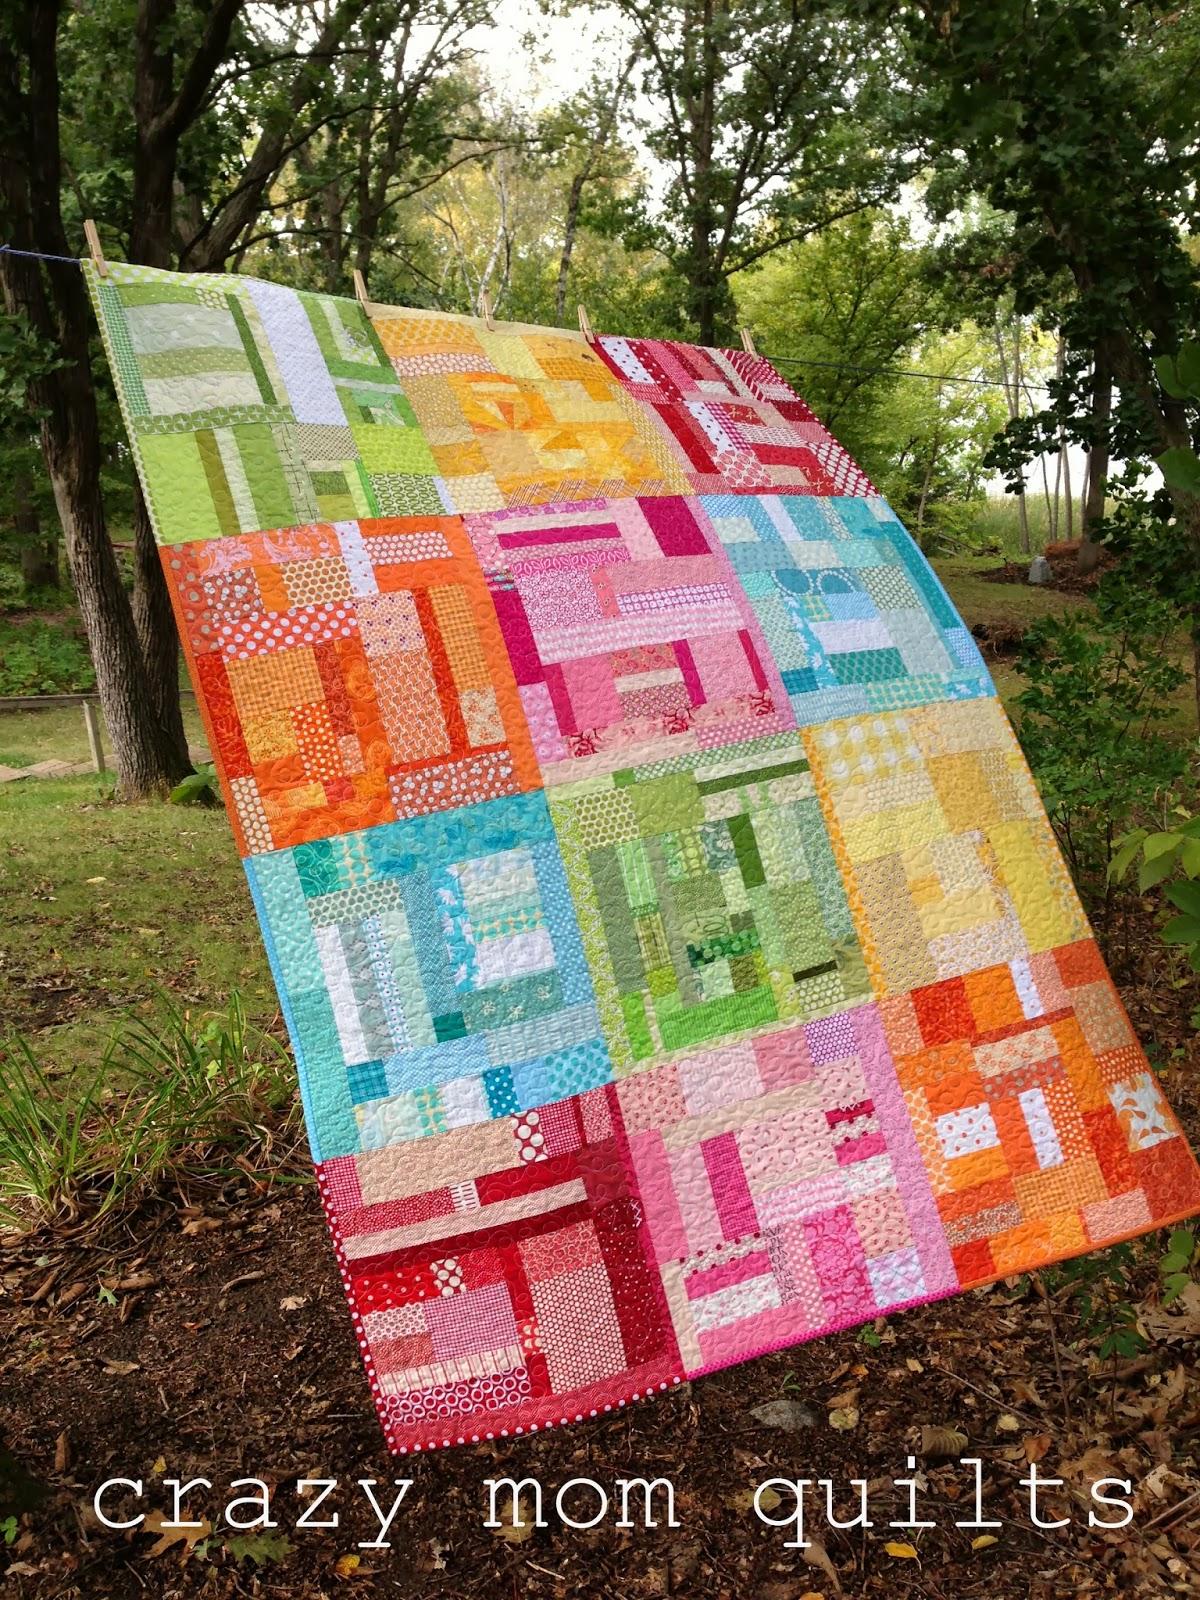 crazy mom quilts: Missing U : crazy mom quilts - Adamdwight.com